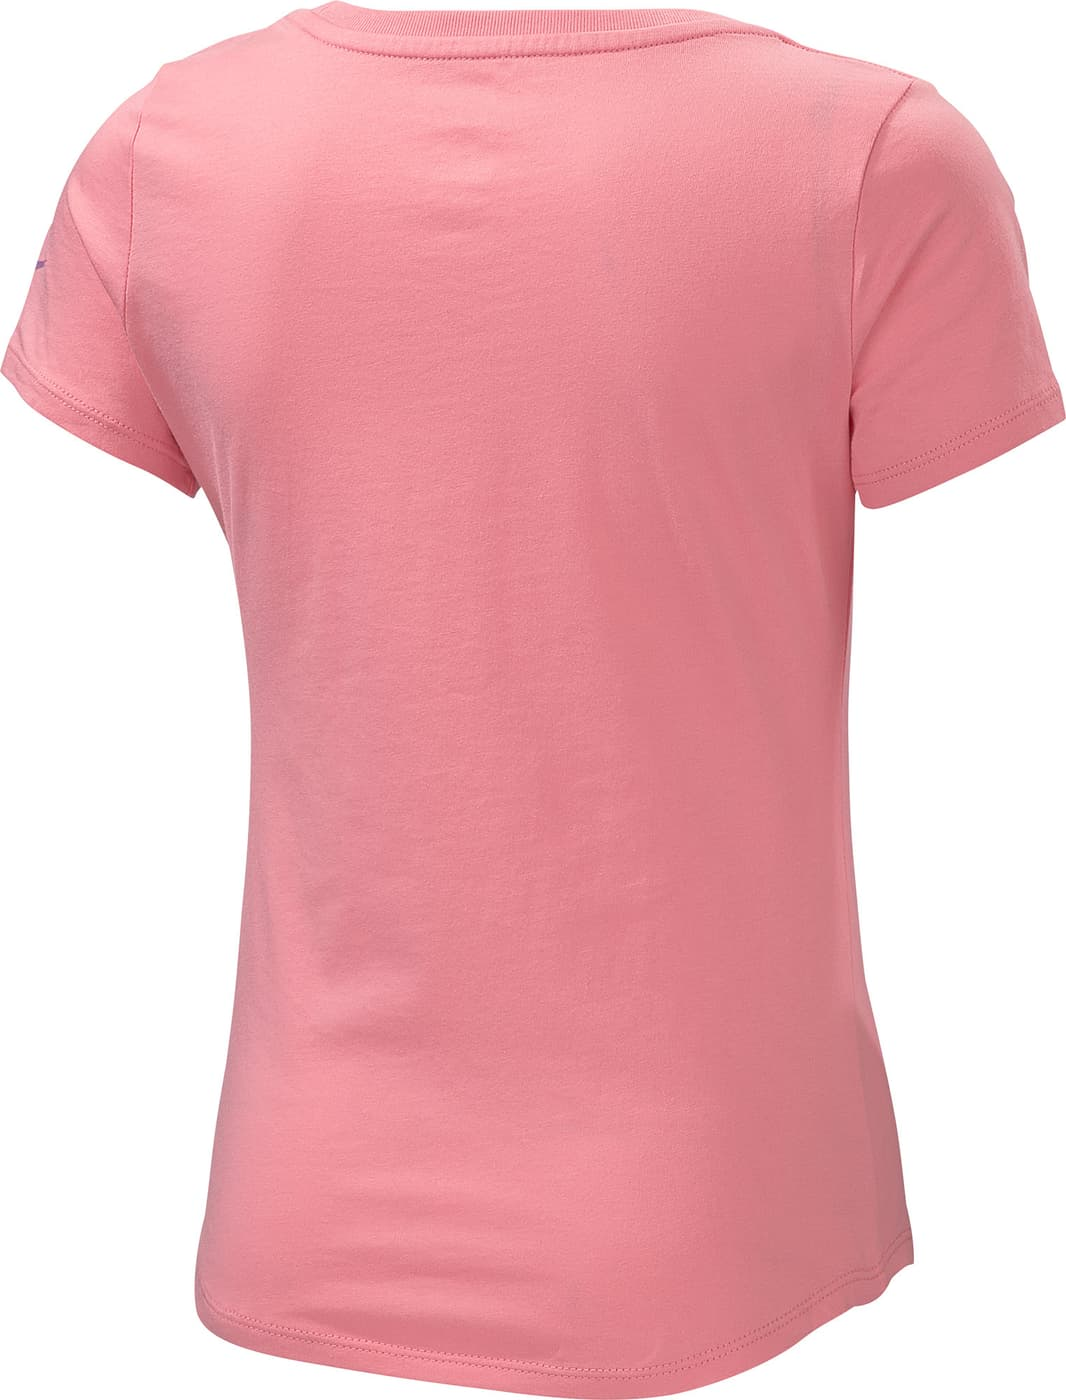 t-shirt mädchen 164 nike